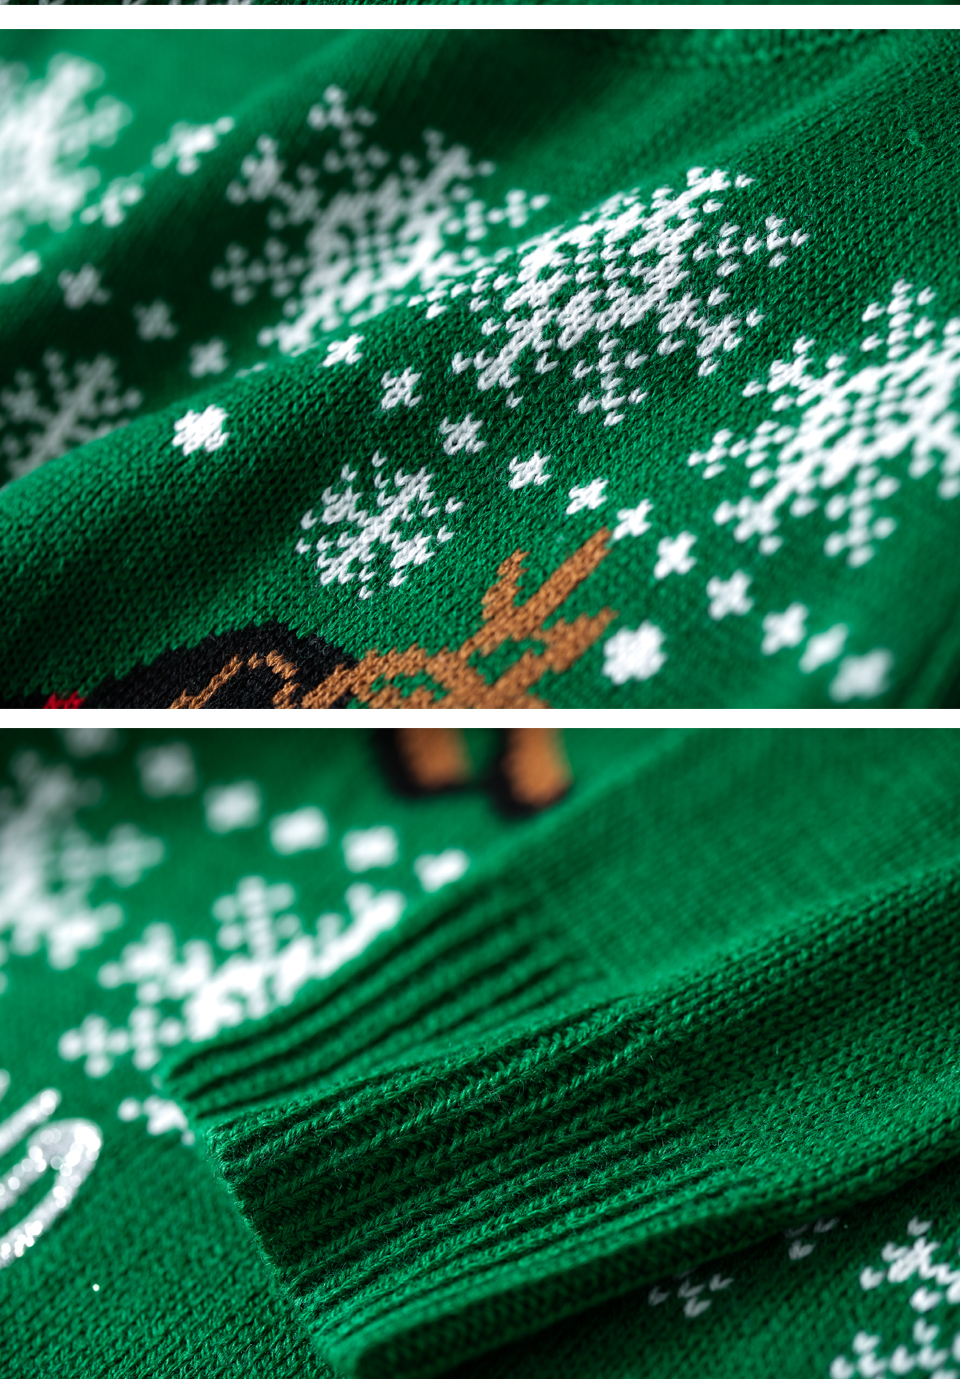 HTB17jHqmvNNTKJjSspcq6z4KVXae - Christmas Sweater Cute Dachshund Embroidery Snow Letter Women Pullovers Long Sleeve Knitting Outwear PTC 287